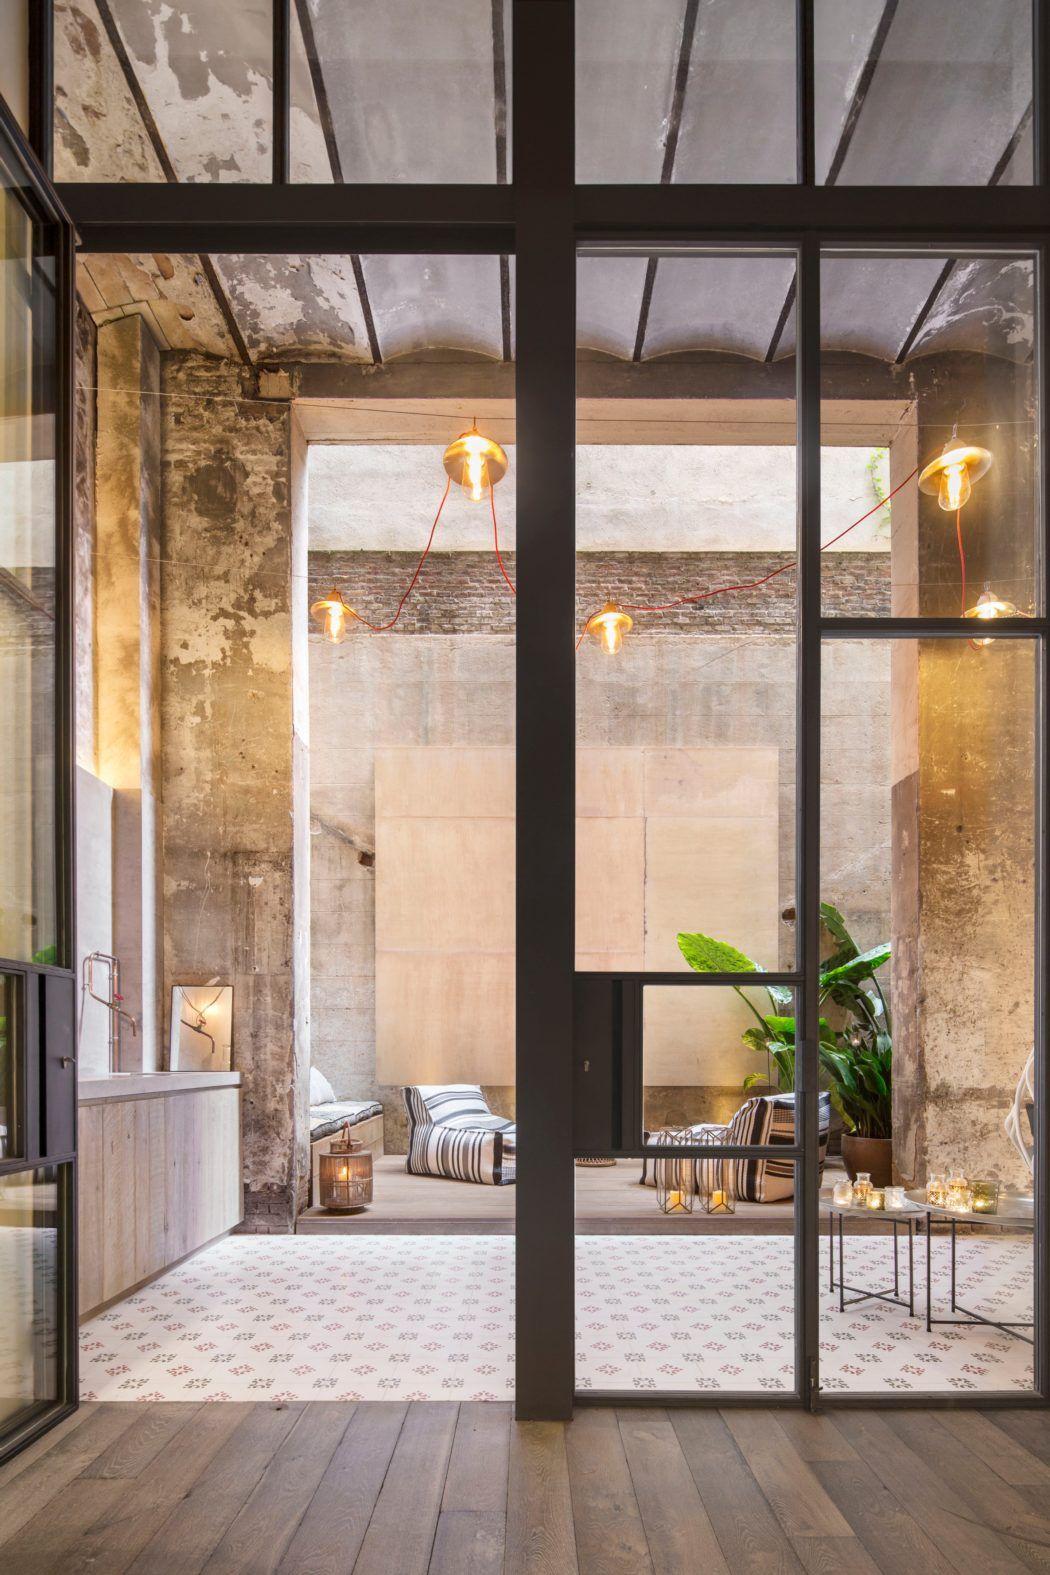 Espai parís by meritxell ribé the room studio design